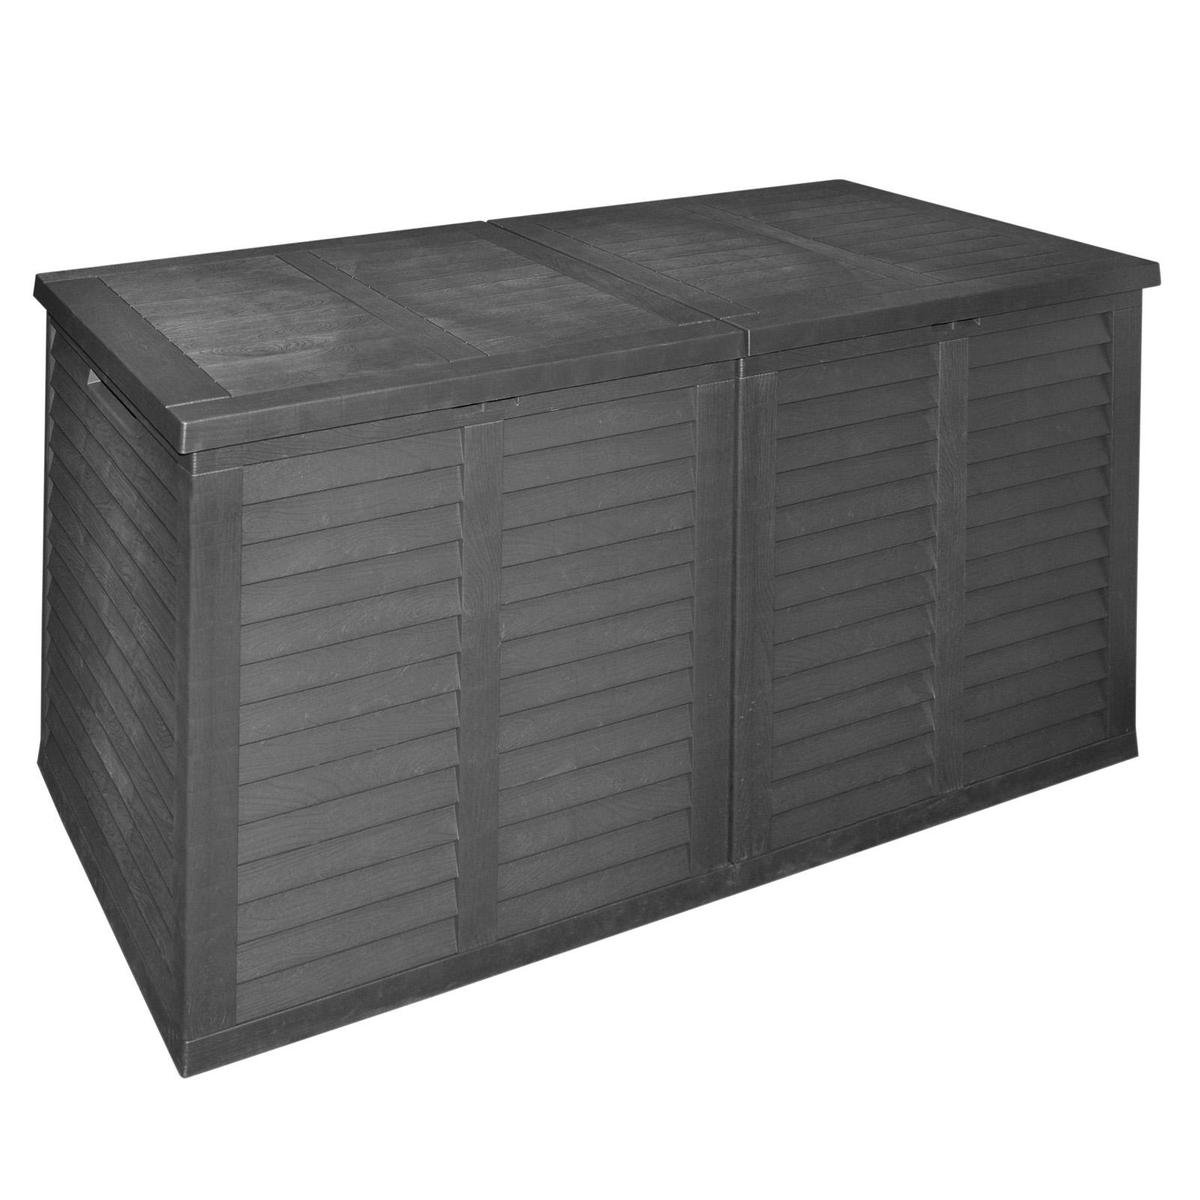 Opbergbox XXL - Tuinkist - Kunststof - 750L - Zwart